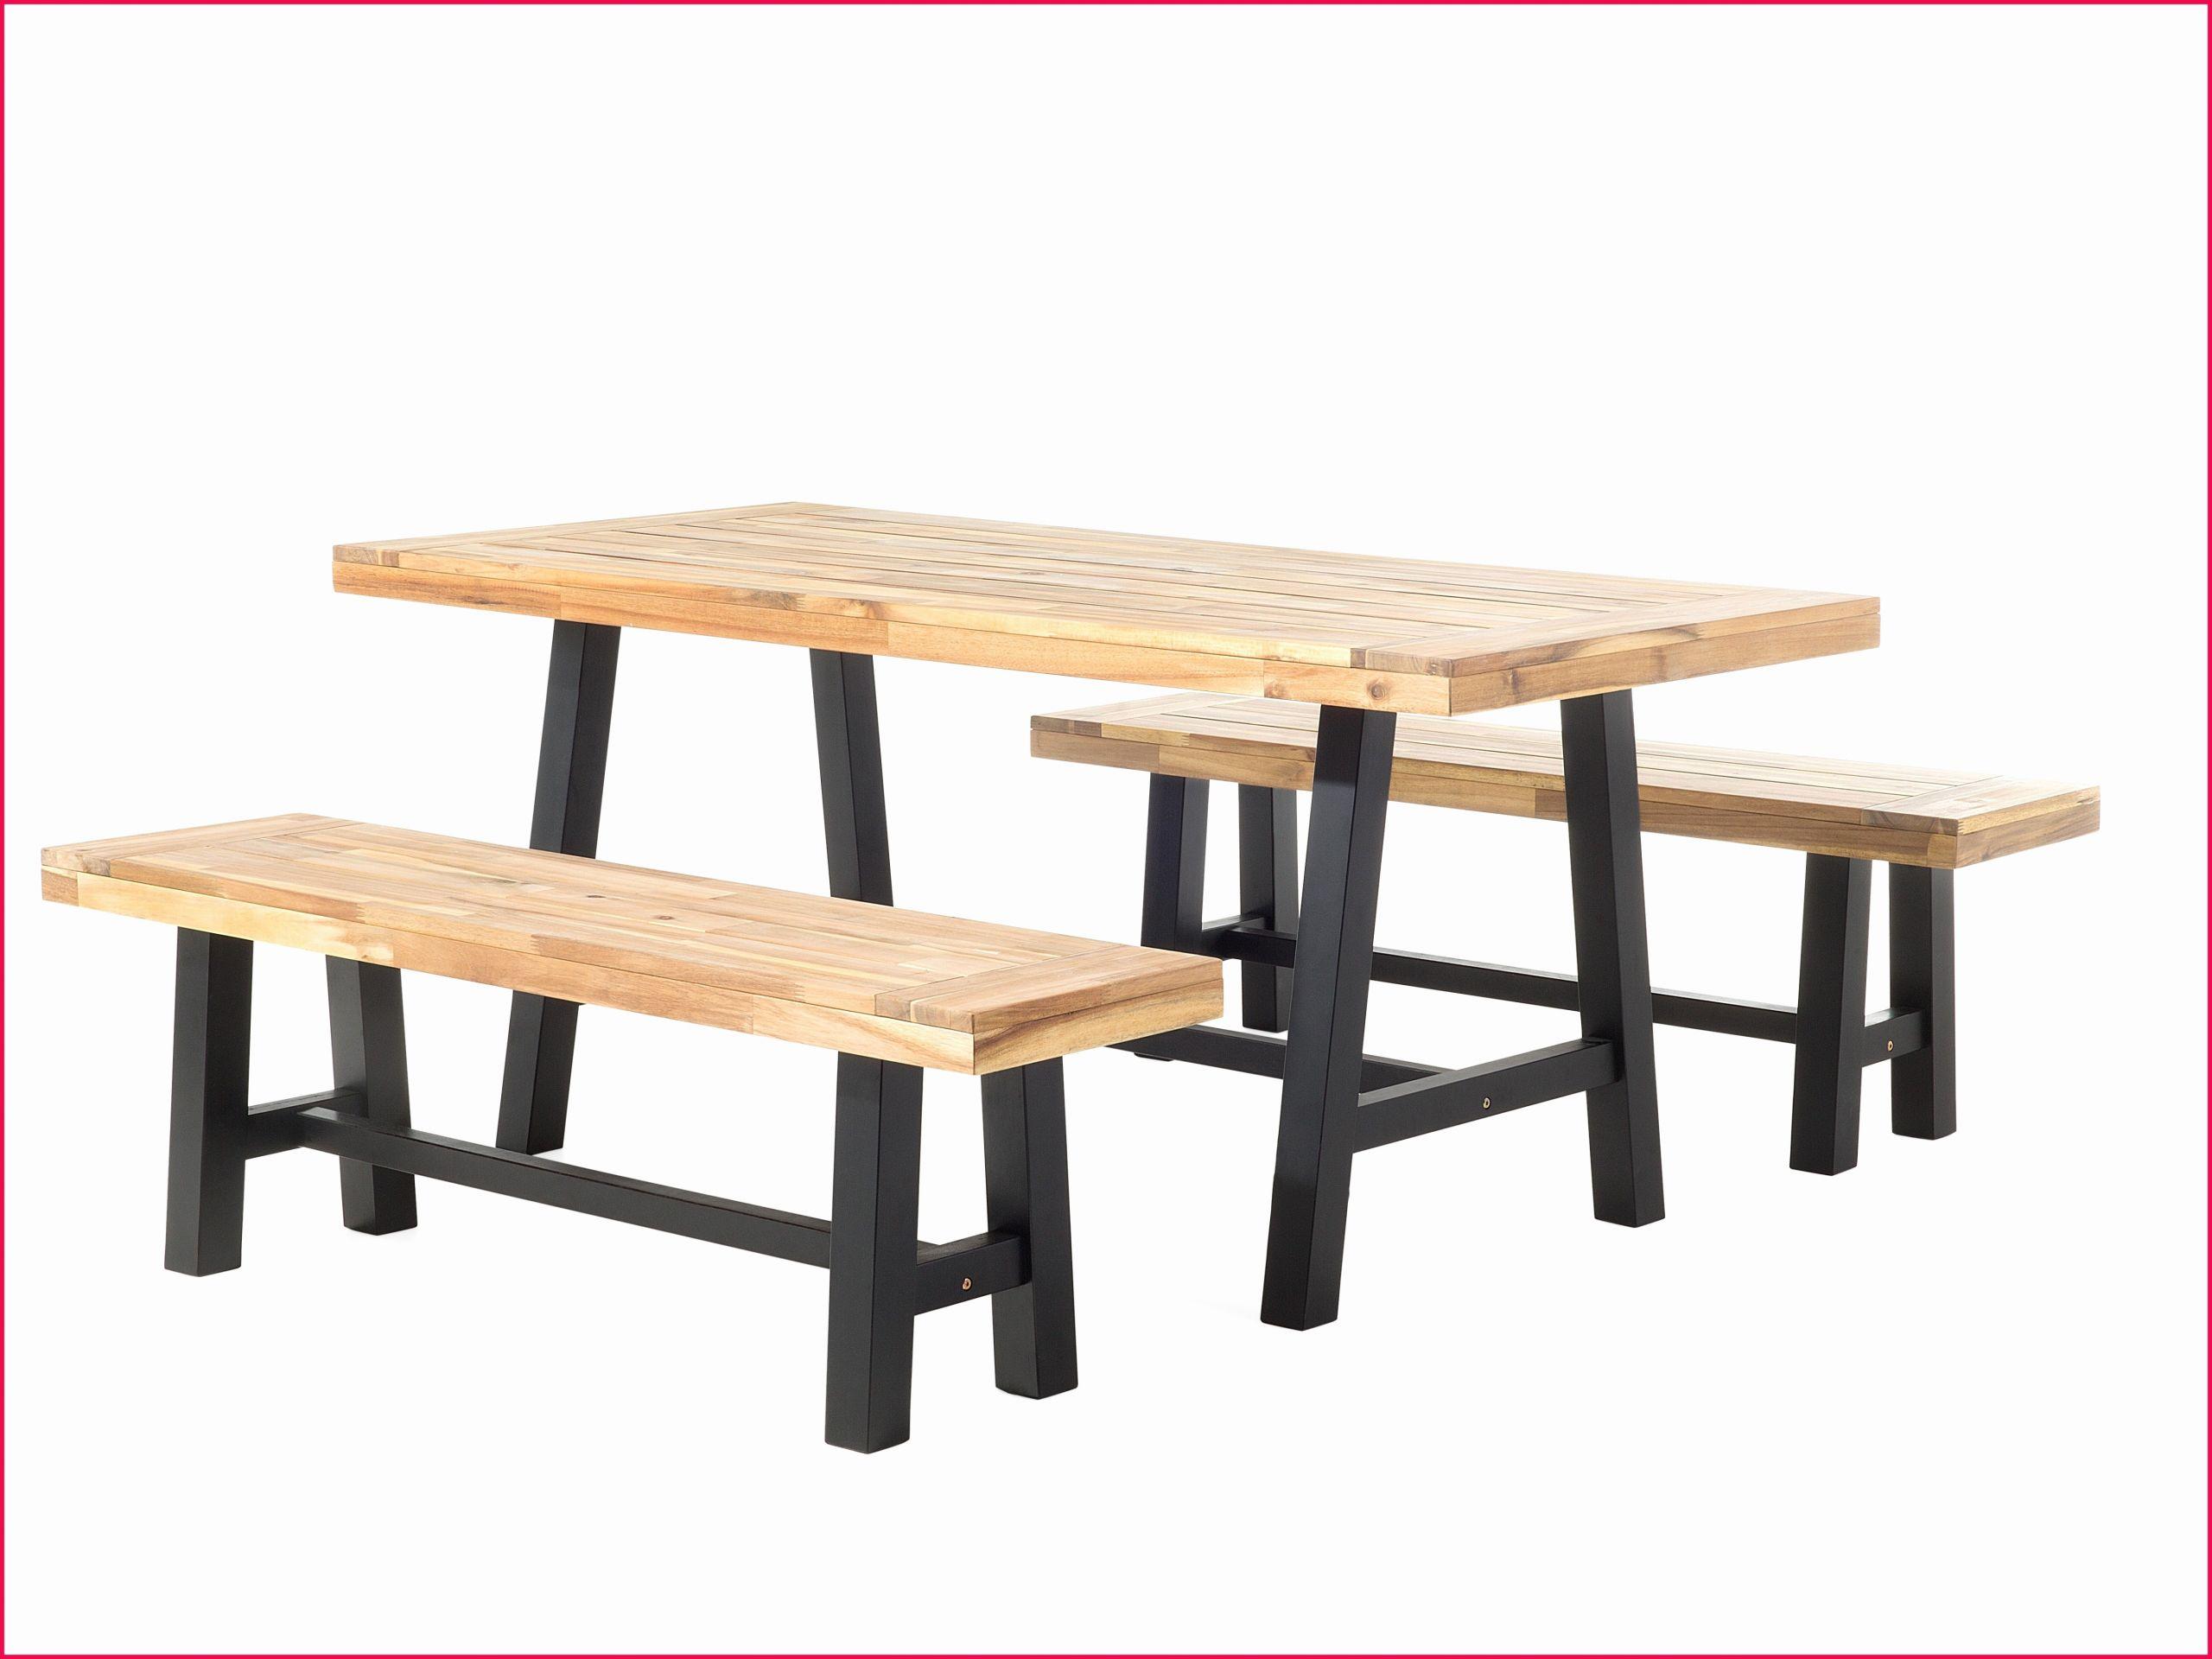 table basse teck nouveau table basse en teck table basse en bois new awesome table bois 0d of table basse teck